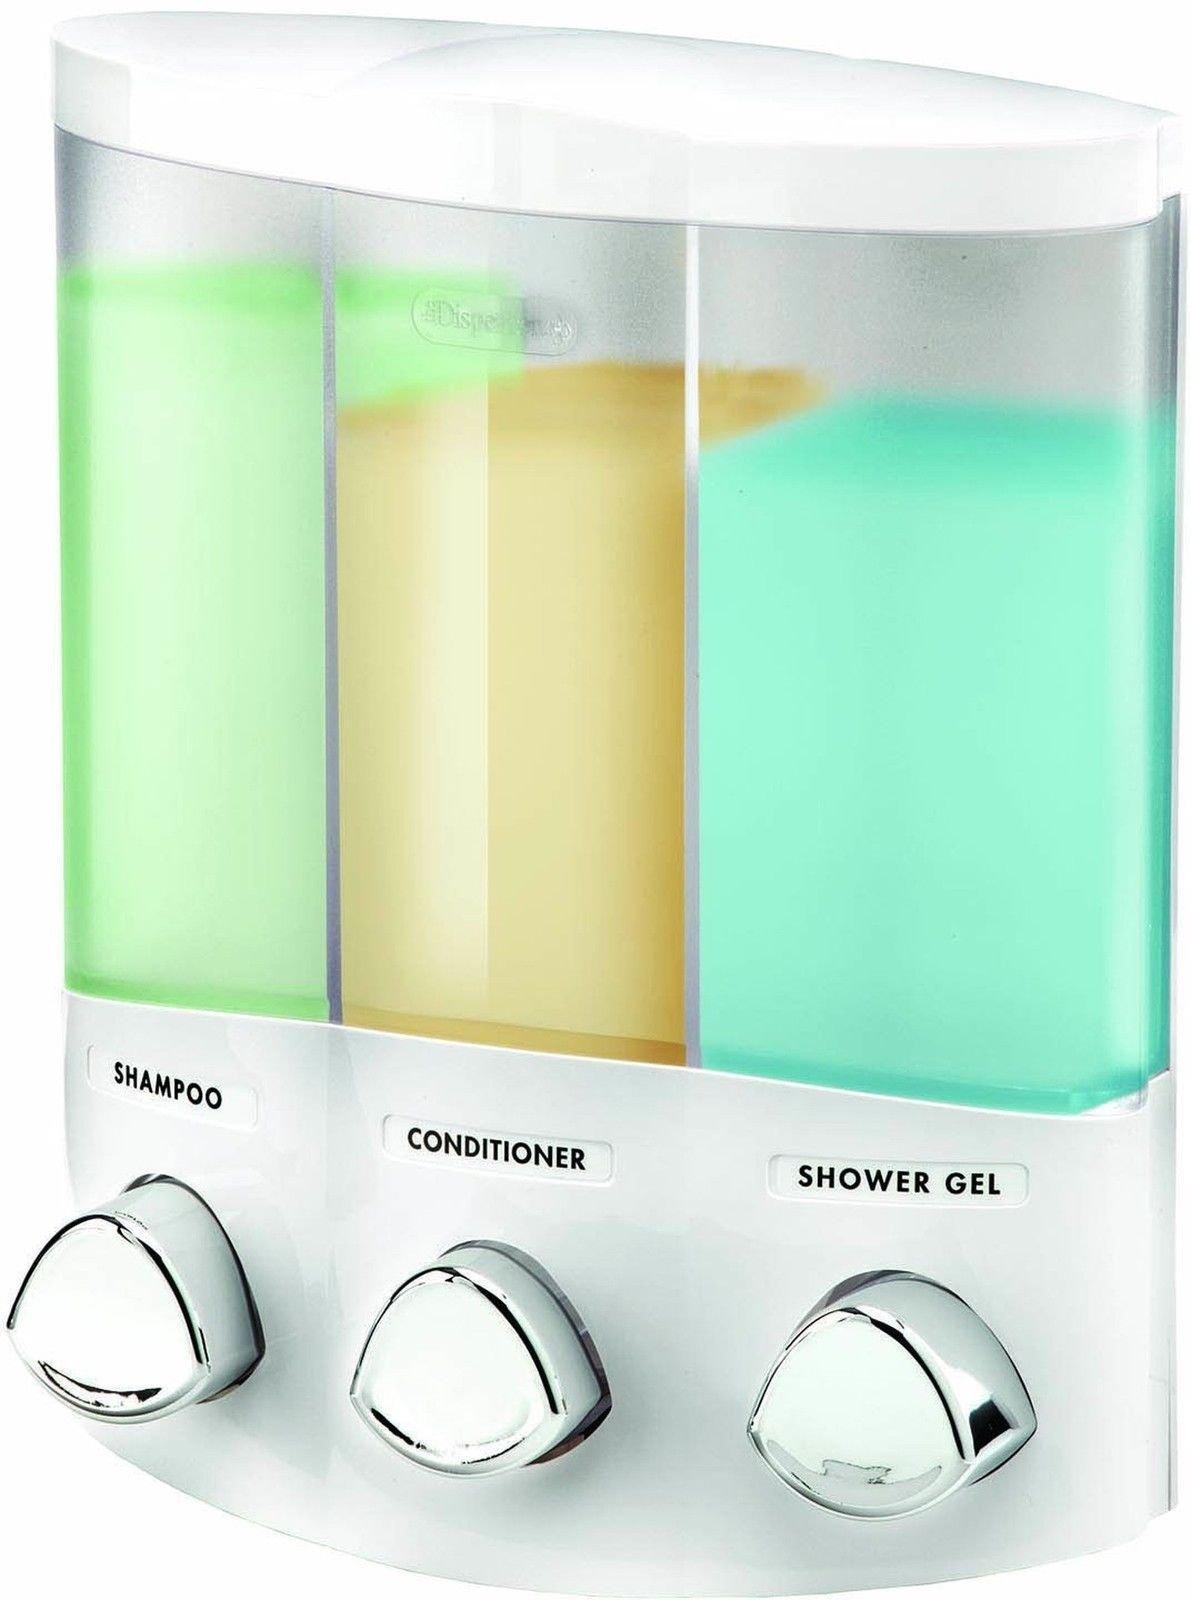 3 Chamber Shampoo Conditioner Soap Dispenser. Bathroom Shower Bath Tub Wall Pump